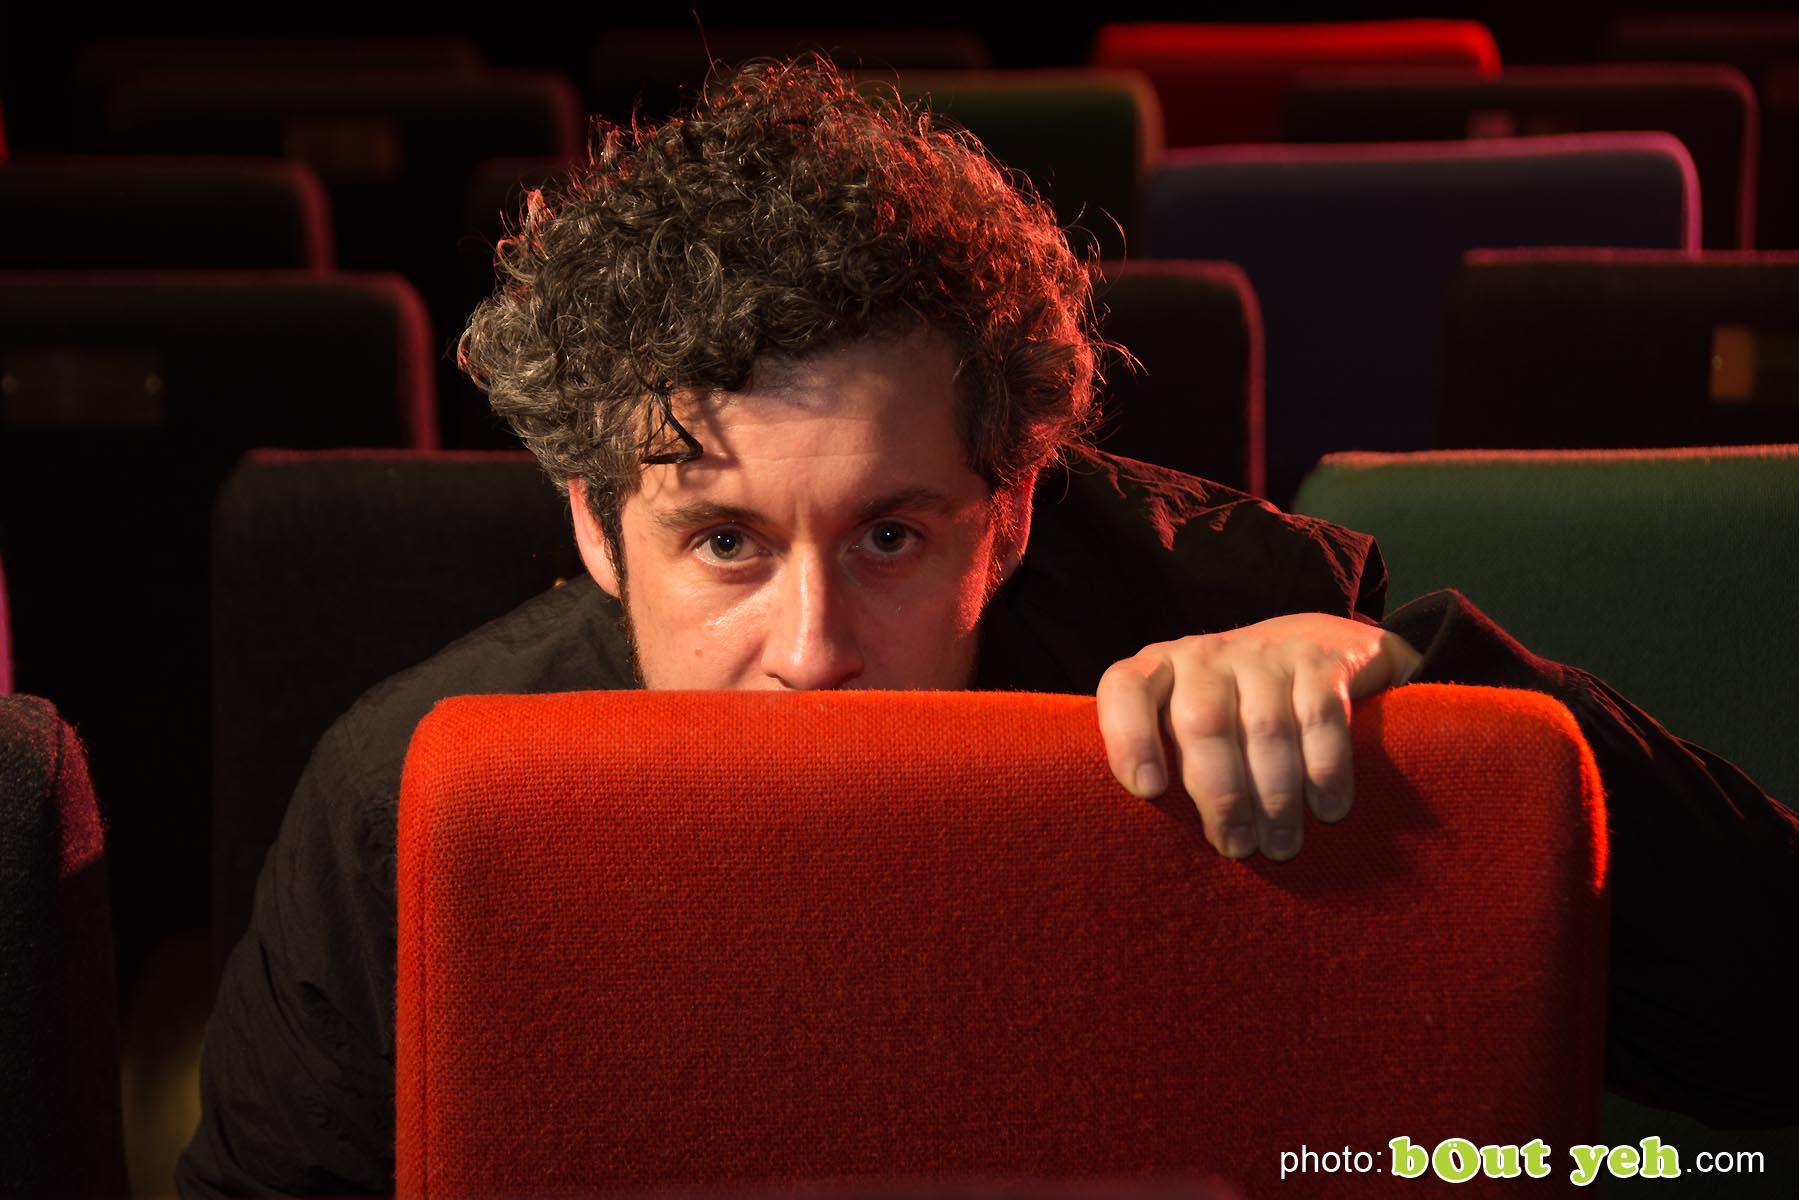 Lee Cronin, movie director photographed at Queens Film Theatre, Belfast - photo 6656.